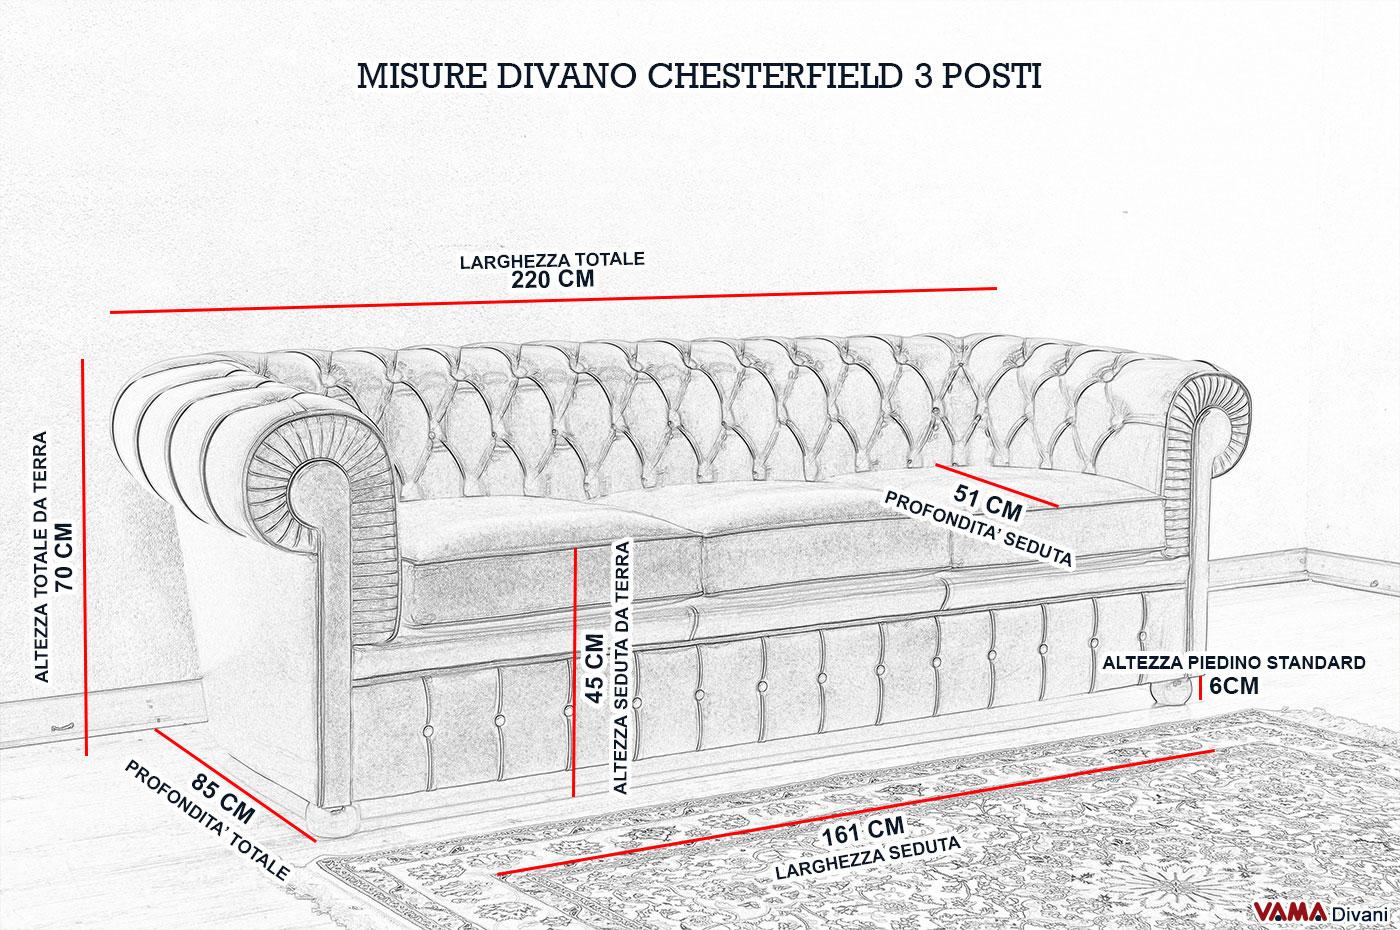 Divano chesterfield 3 posti vama divani for Divano 4 posti dimensioni